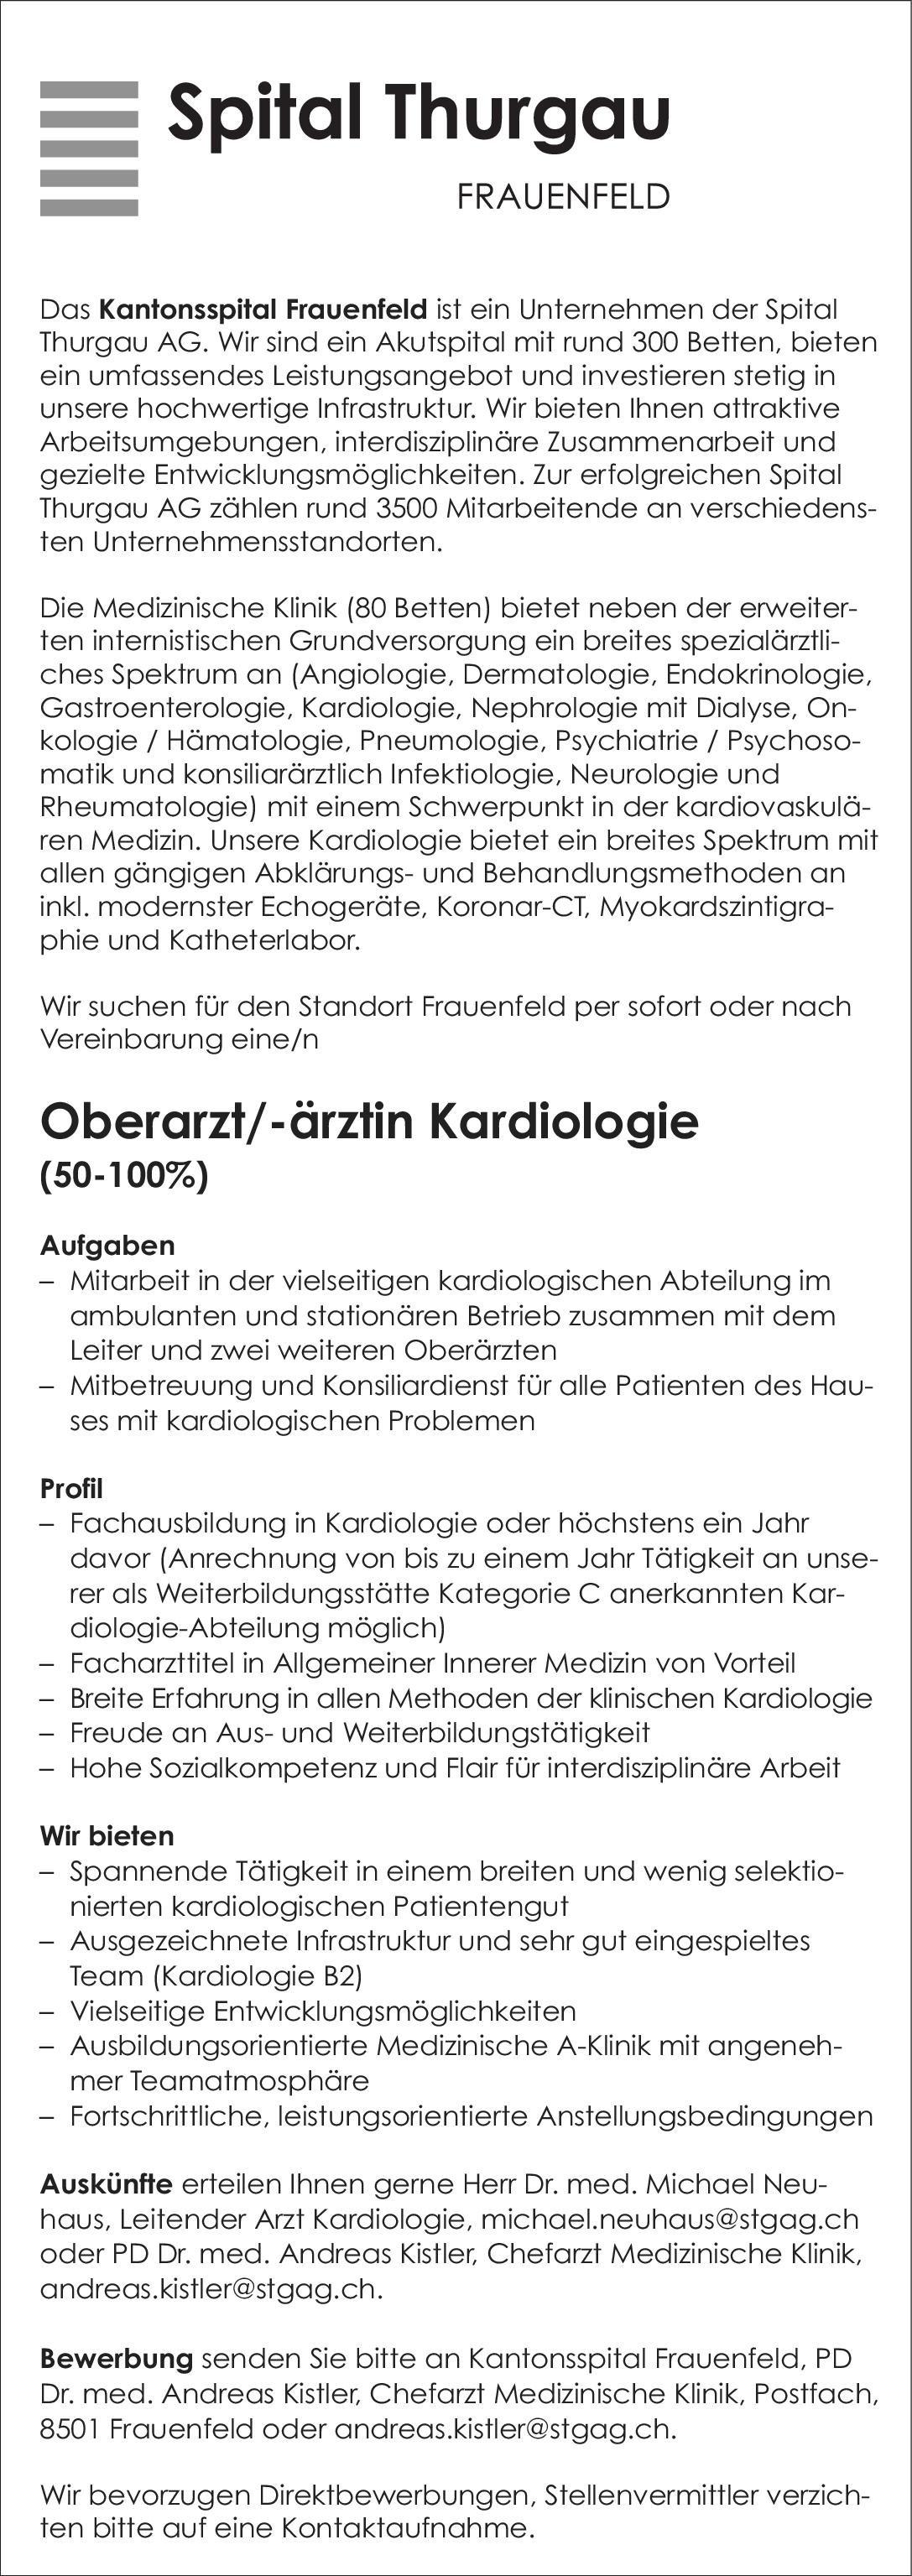 Spital Thurgau - Kantonsspital Frauenfeld Oberarzt/-ärztin Kardiologie 50-100%  Innere Medizin und Kardiologie Oberarzt